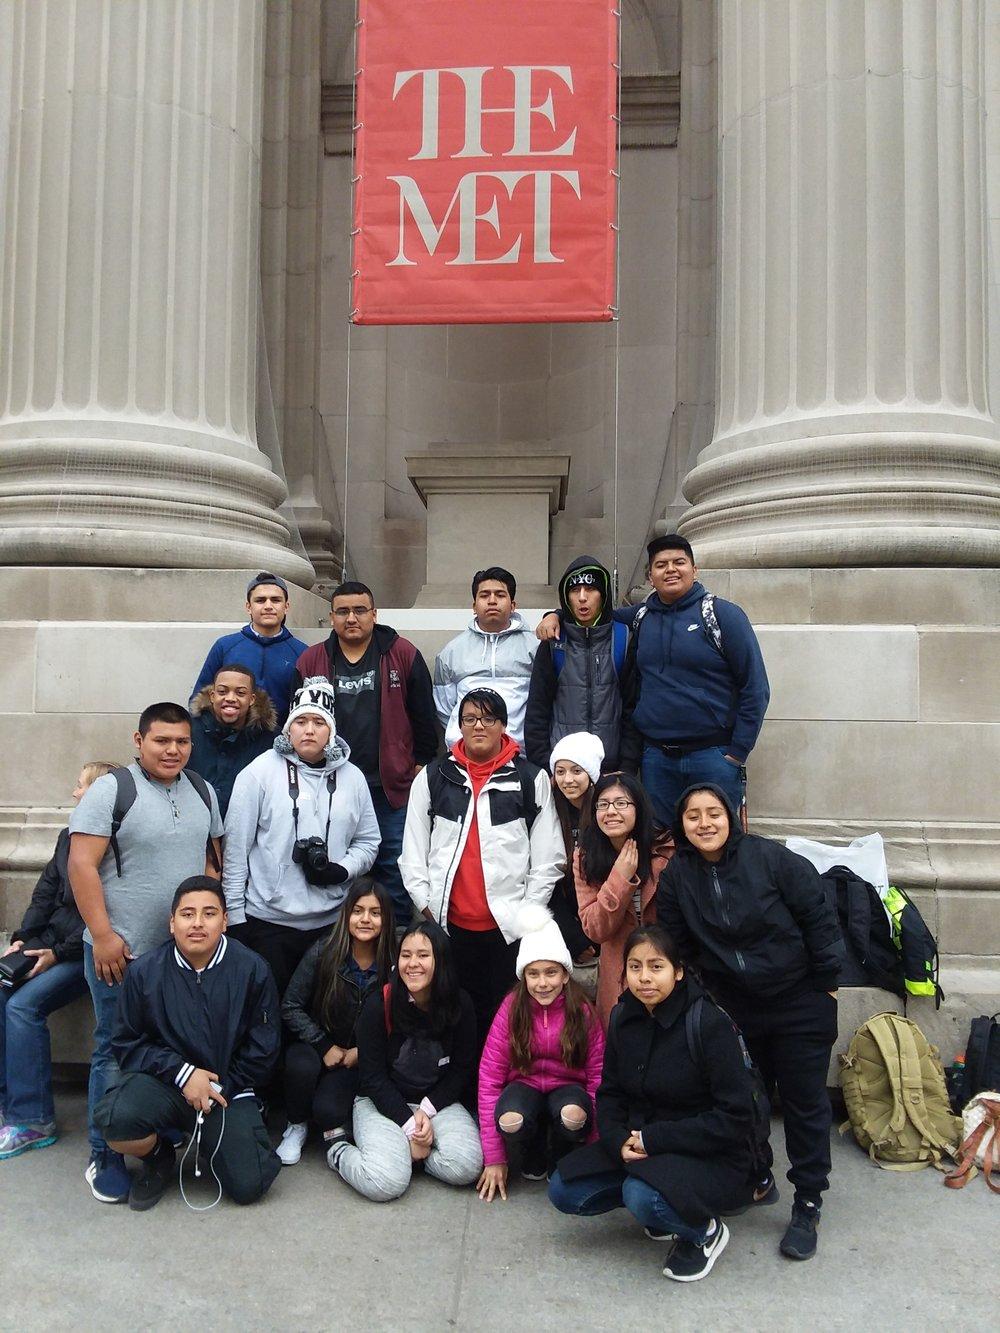 Group Shot - The Met